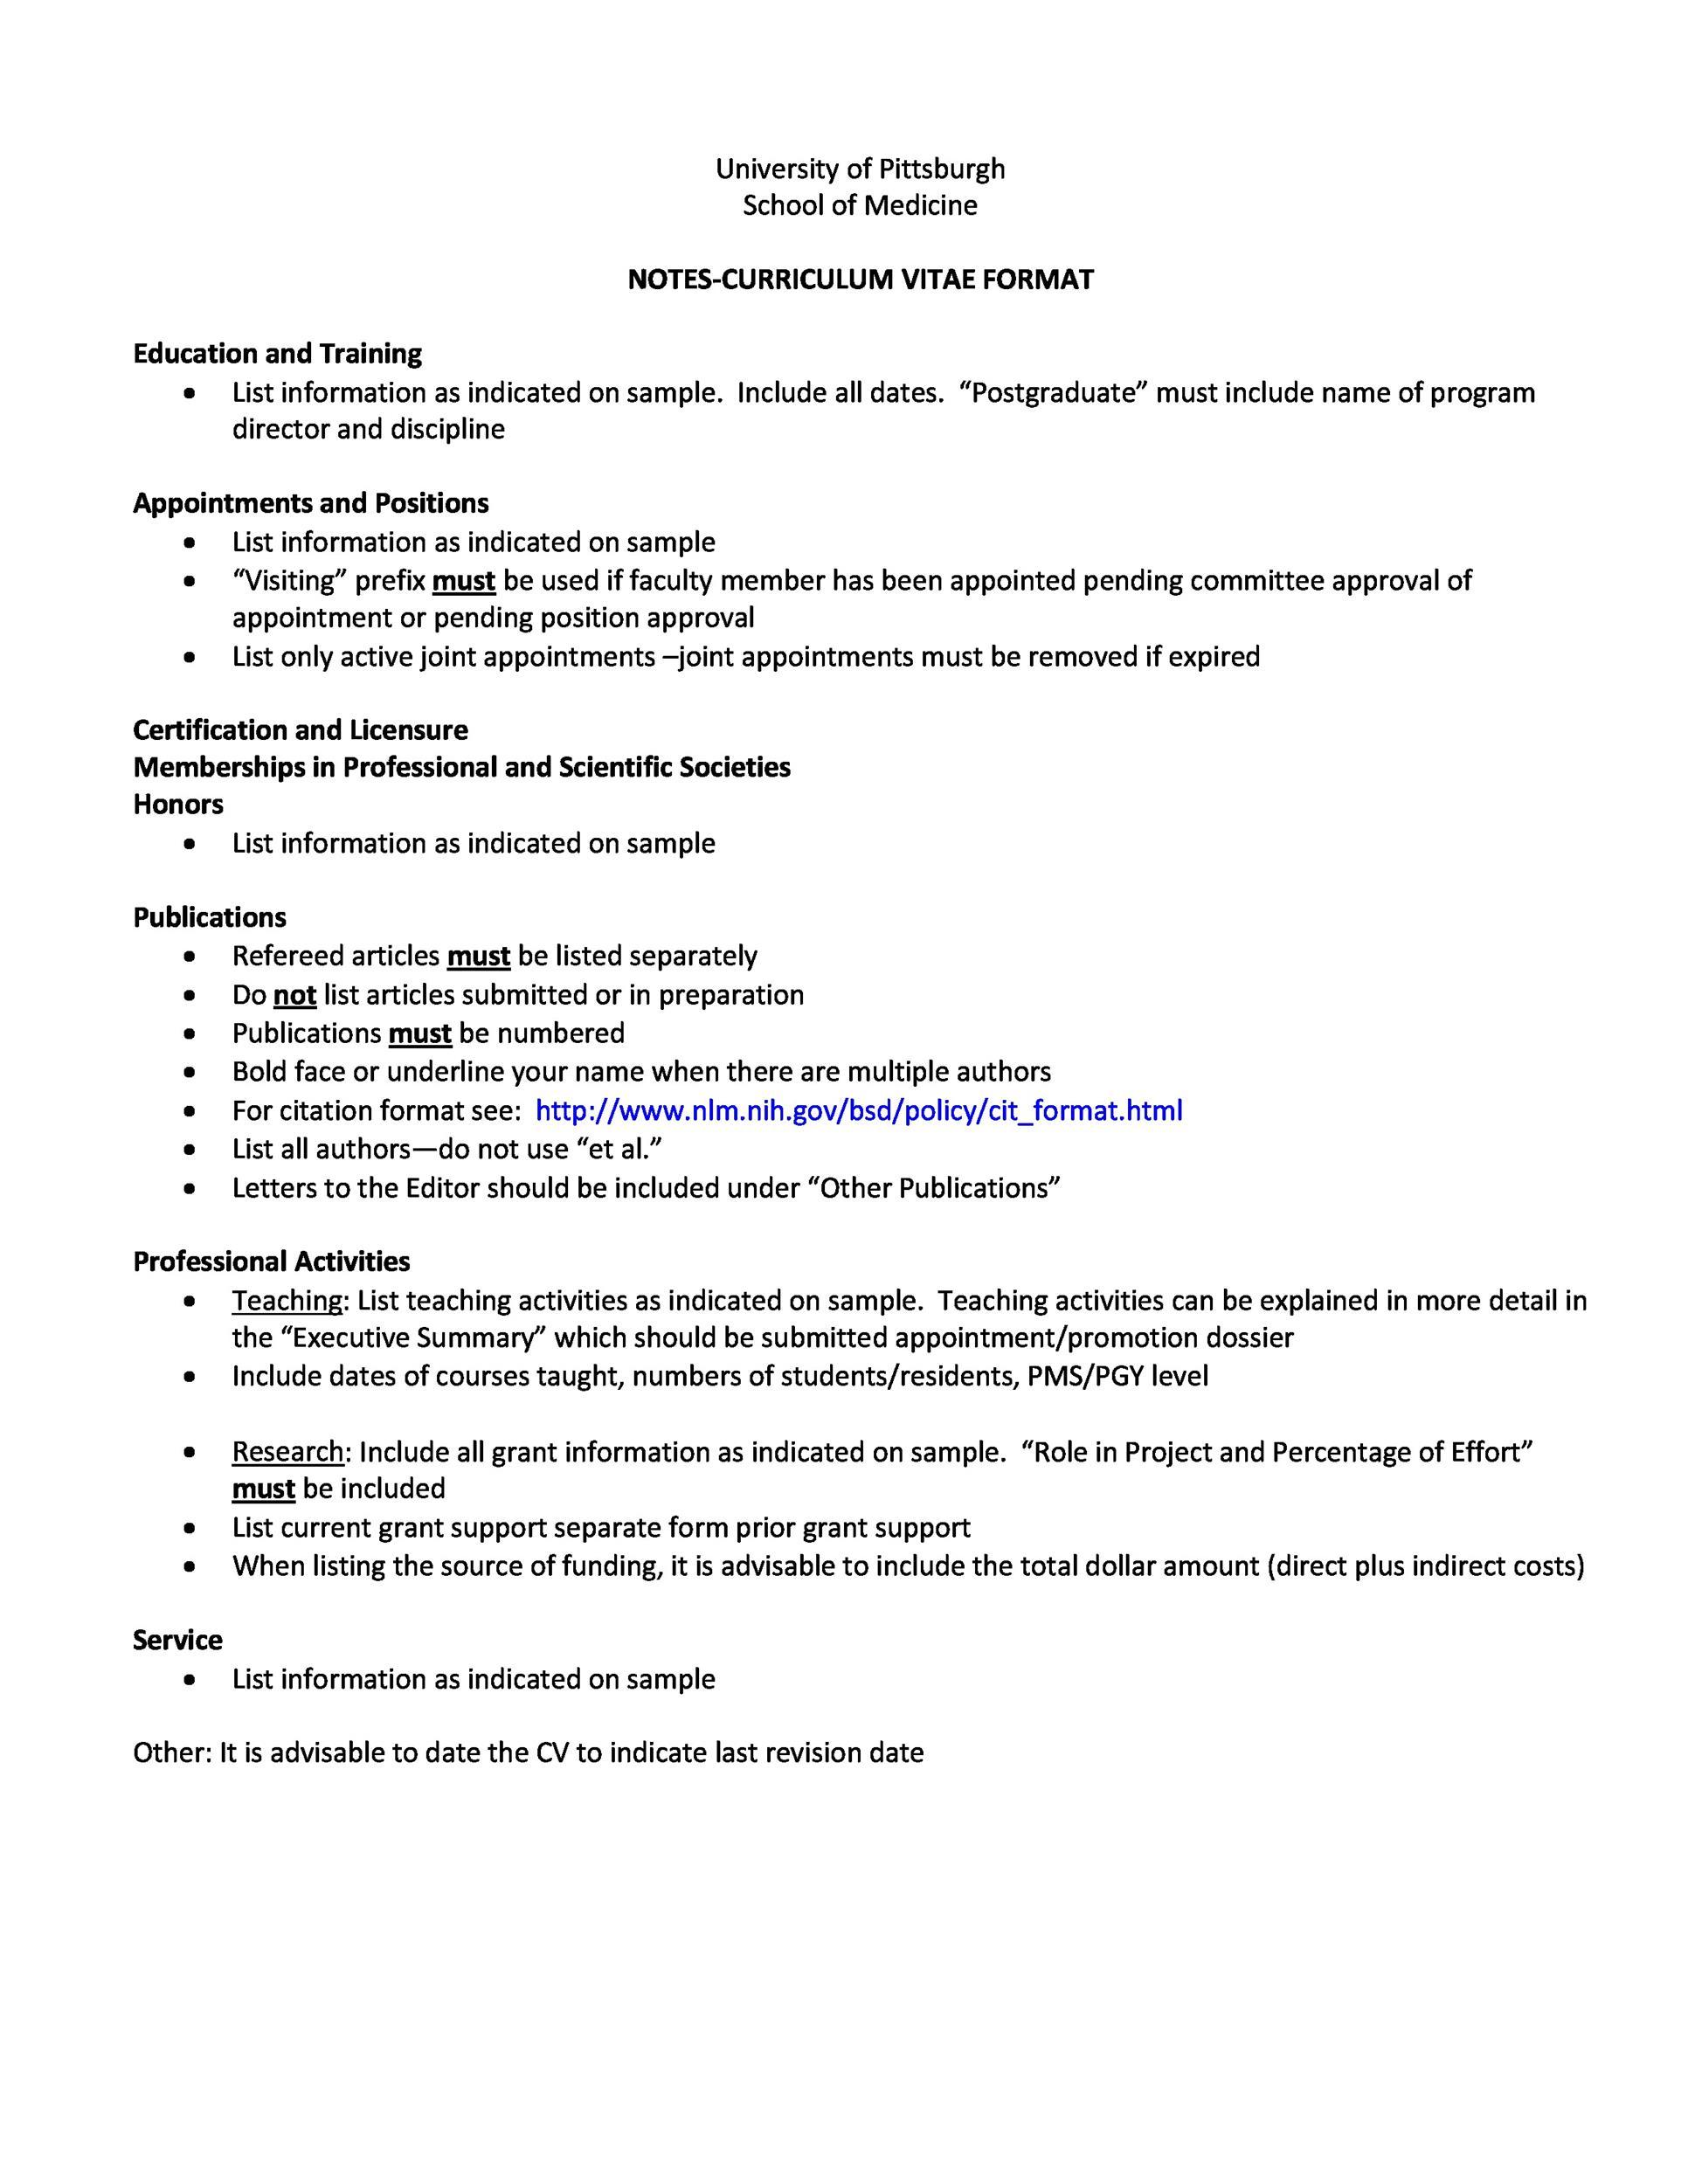 Free curriculum vitae template 16